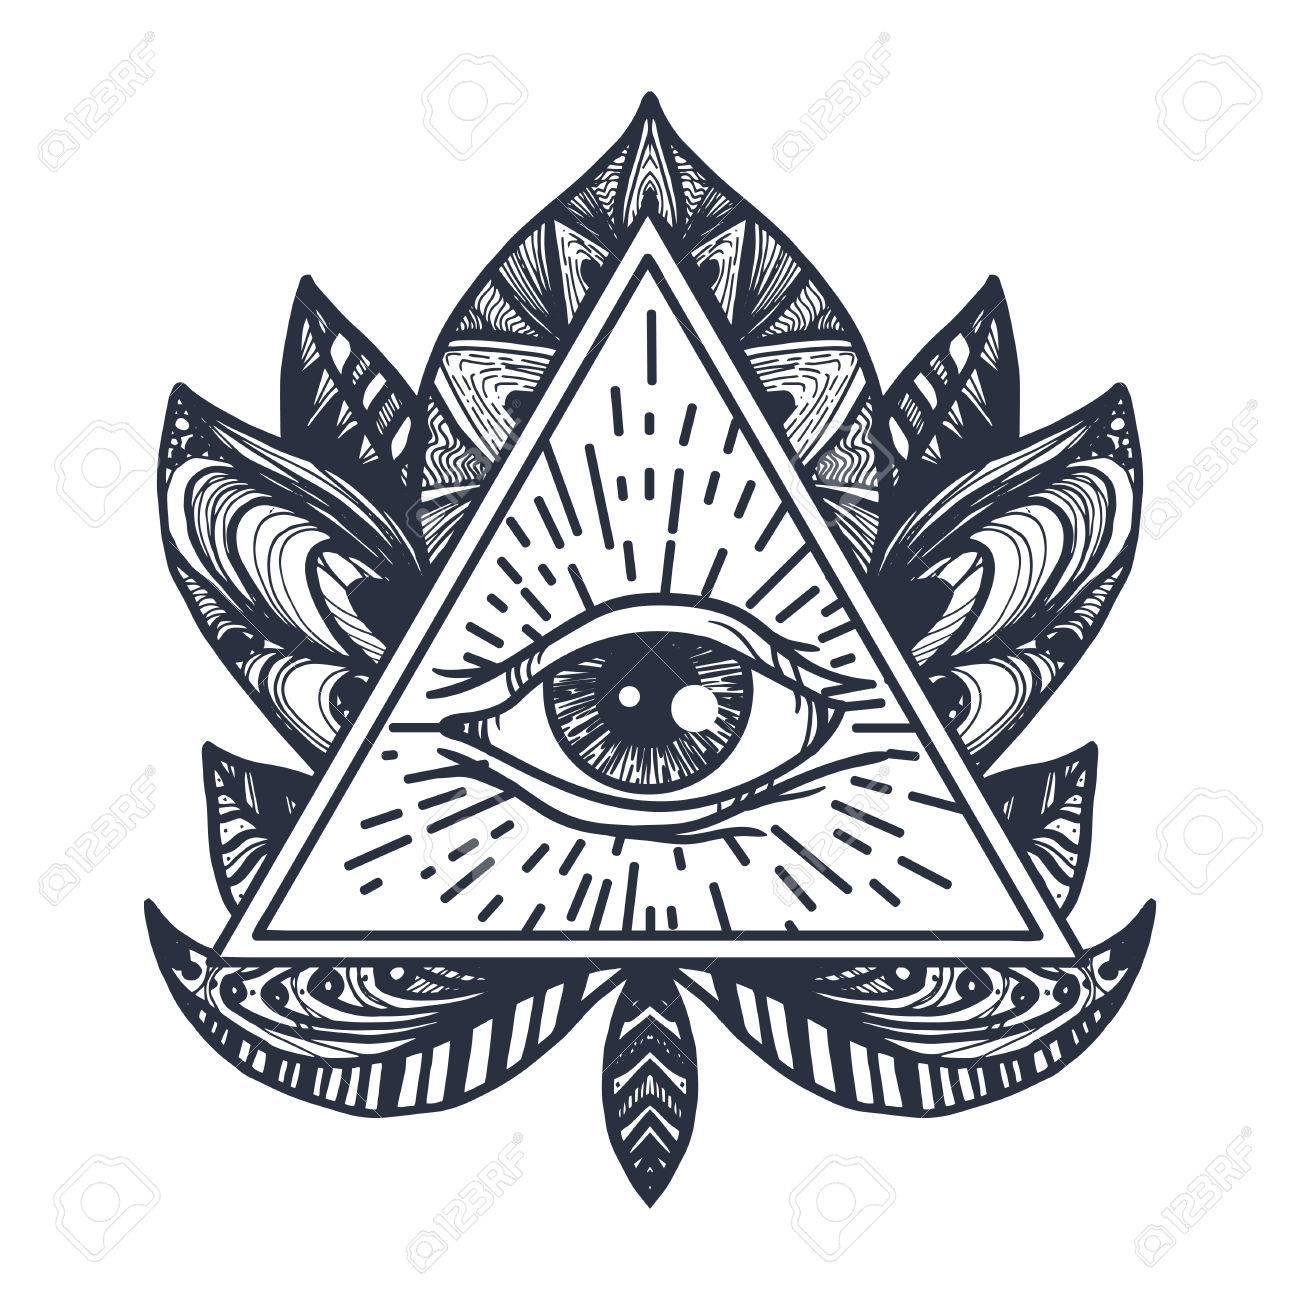 Pentagram stock photos royalty free business images providence magic symbol for print tattoo coloring buycottarizona